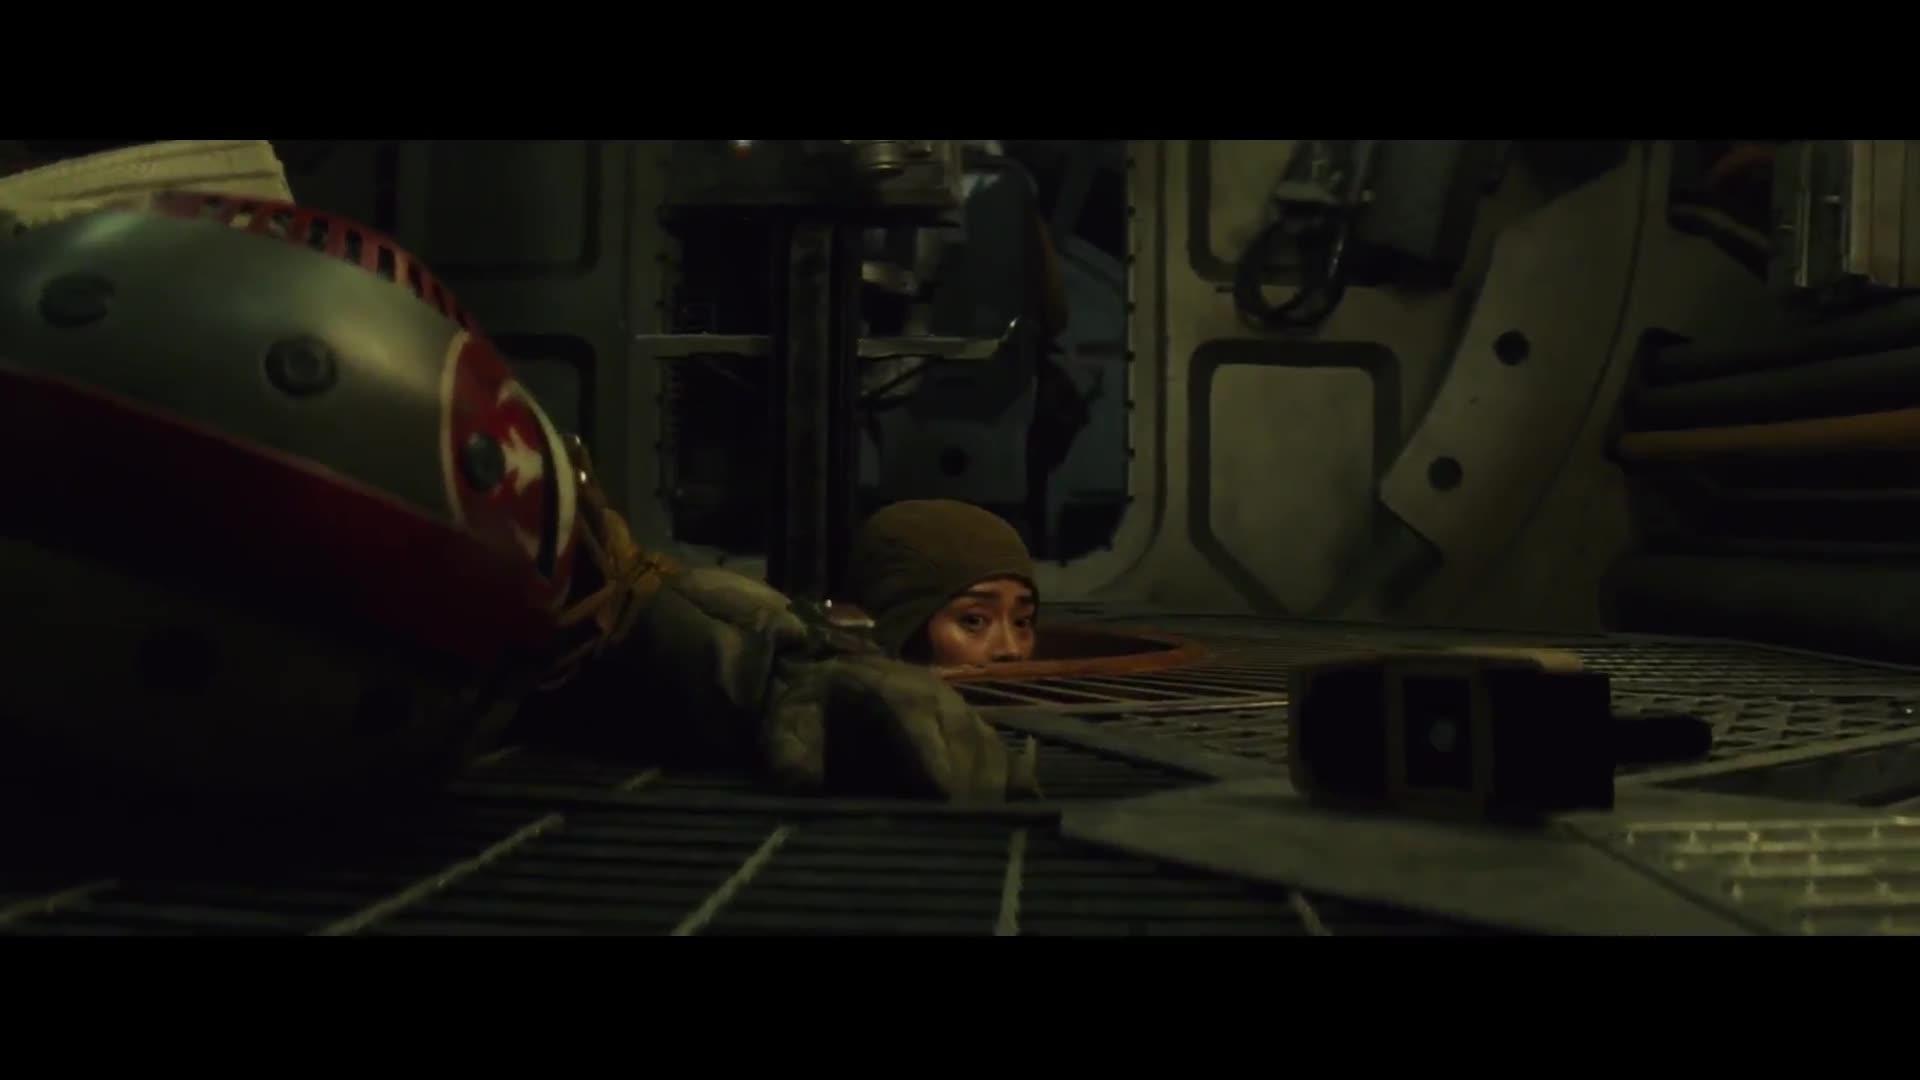 Star War The Force Awakens สตาร์ วอร์ส ปัจฉิมบทแห่งเจได (2017)